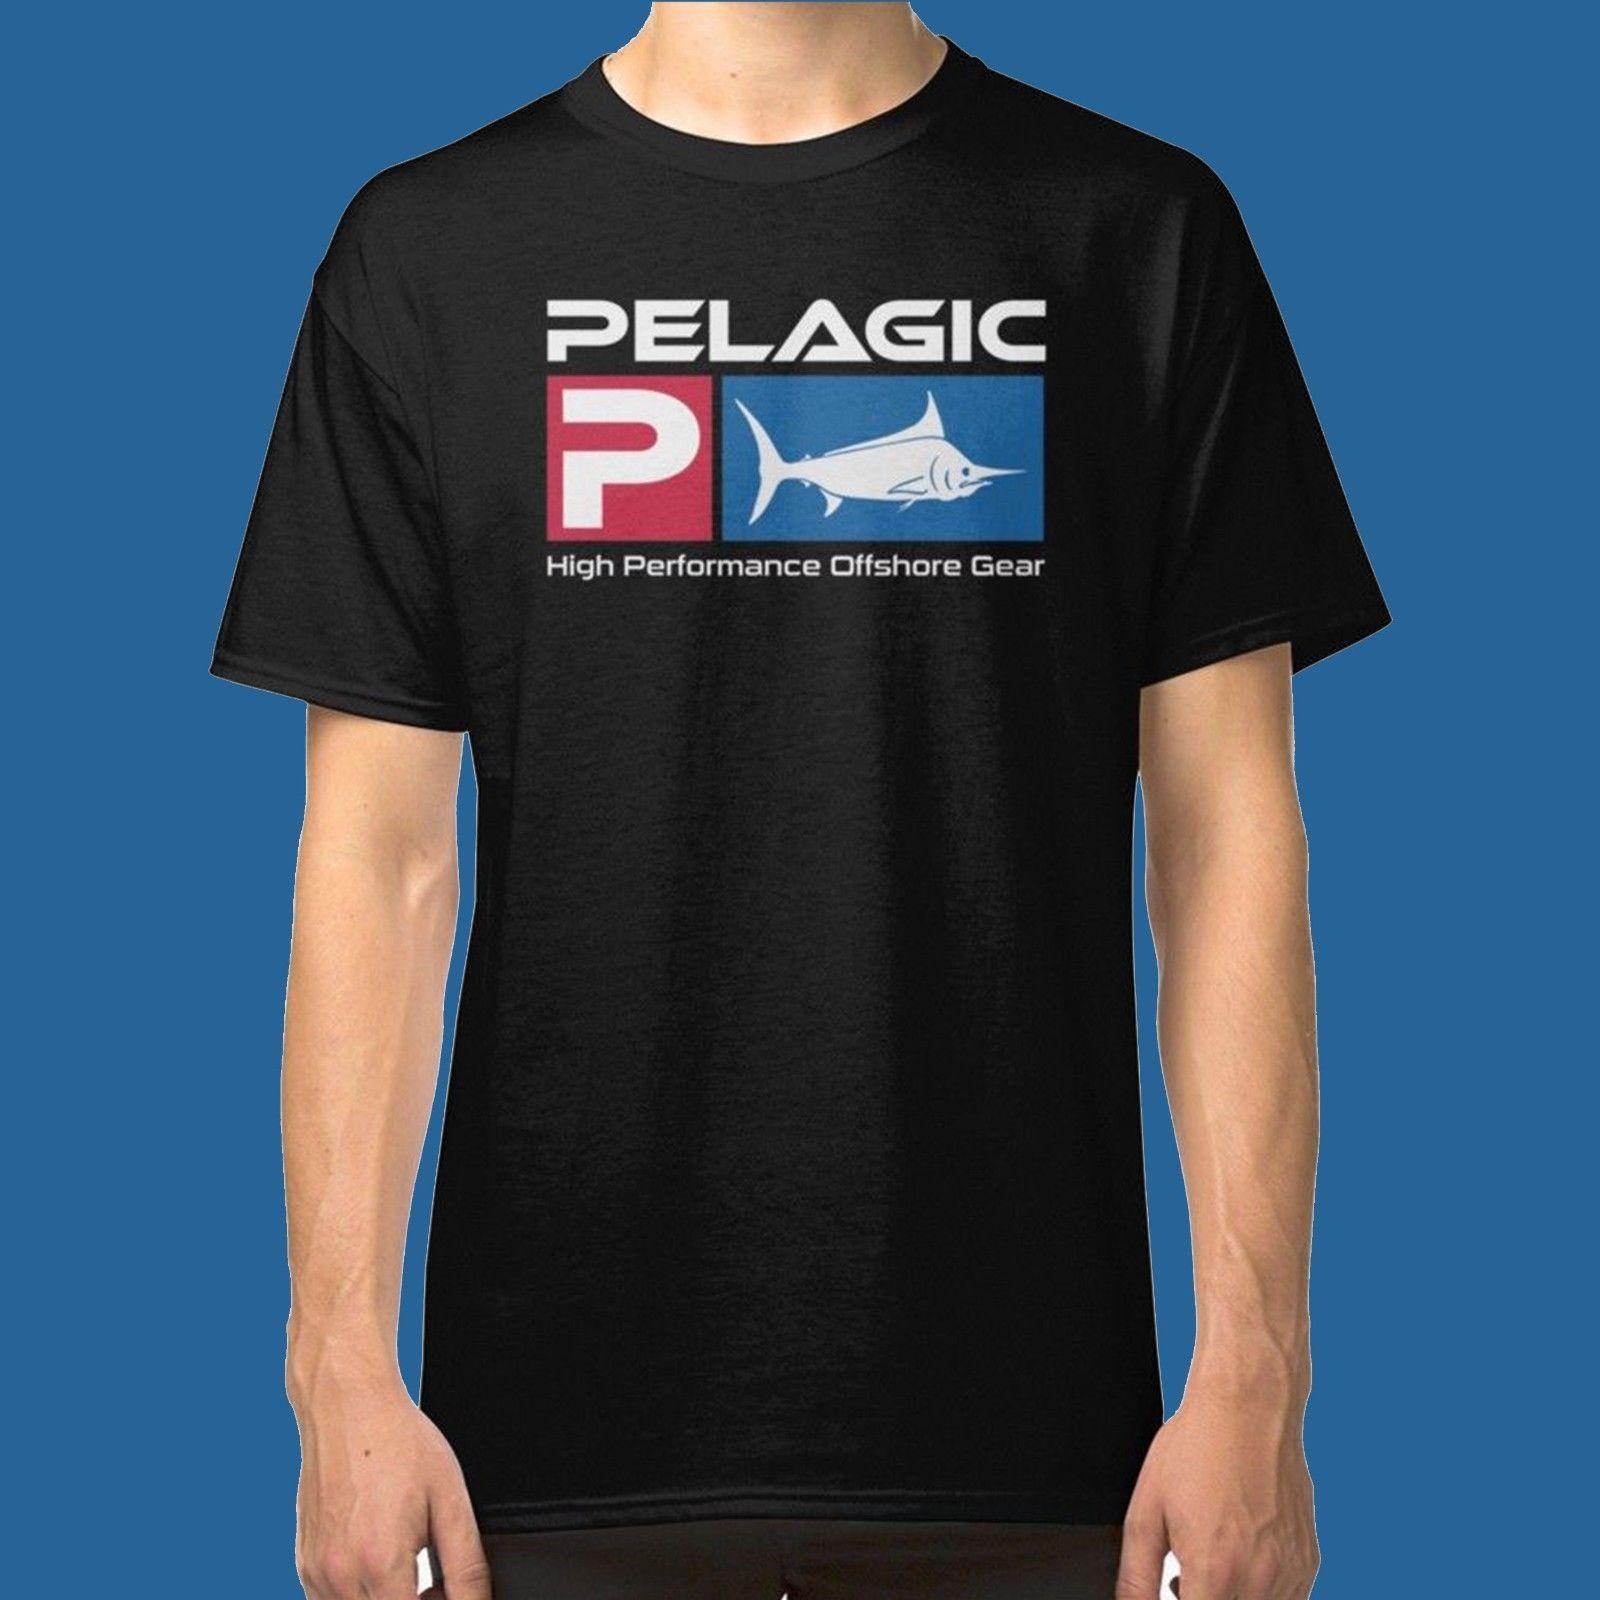 New Pelagic Fishing Offshore T-Shirt Graphic Tee Black Color Size S M L XL 2XL 100% cotton tee shirt,  tops wholesale tee